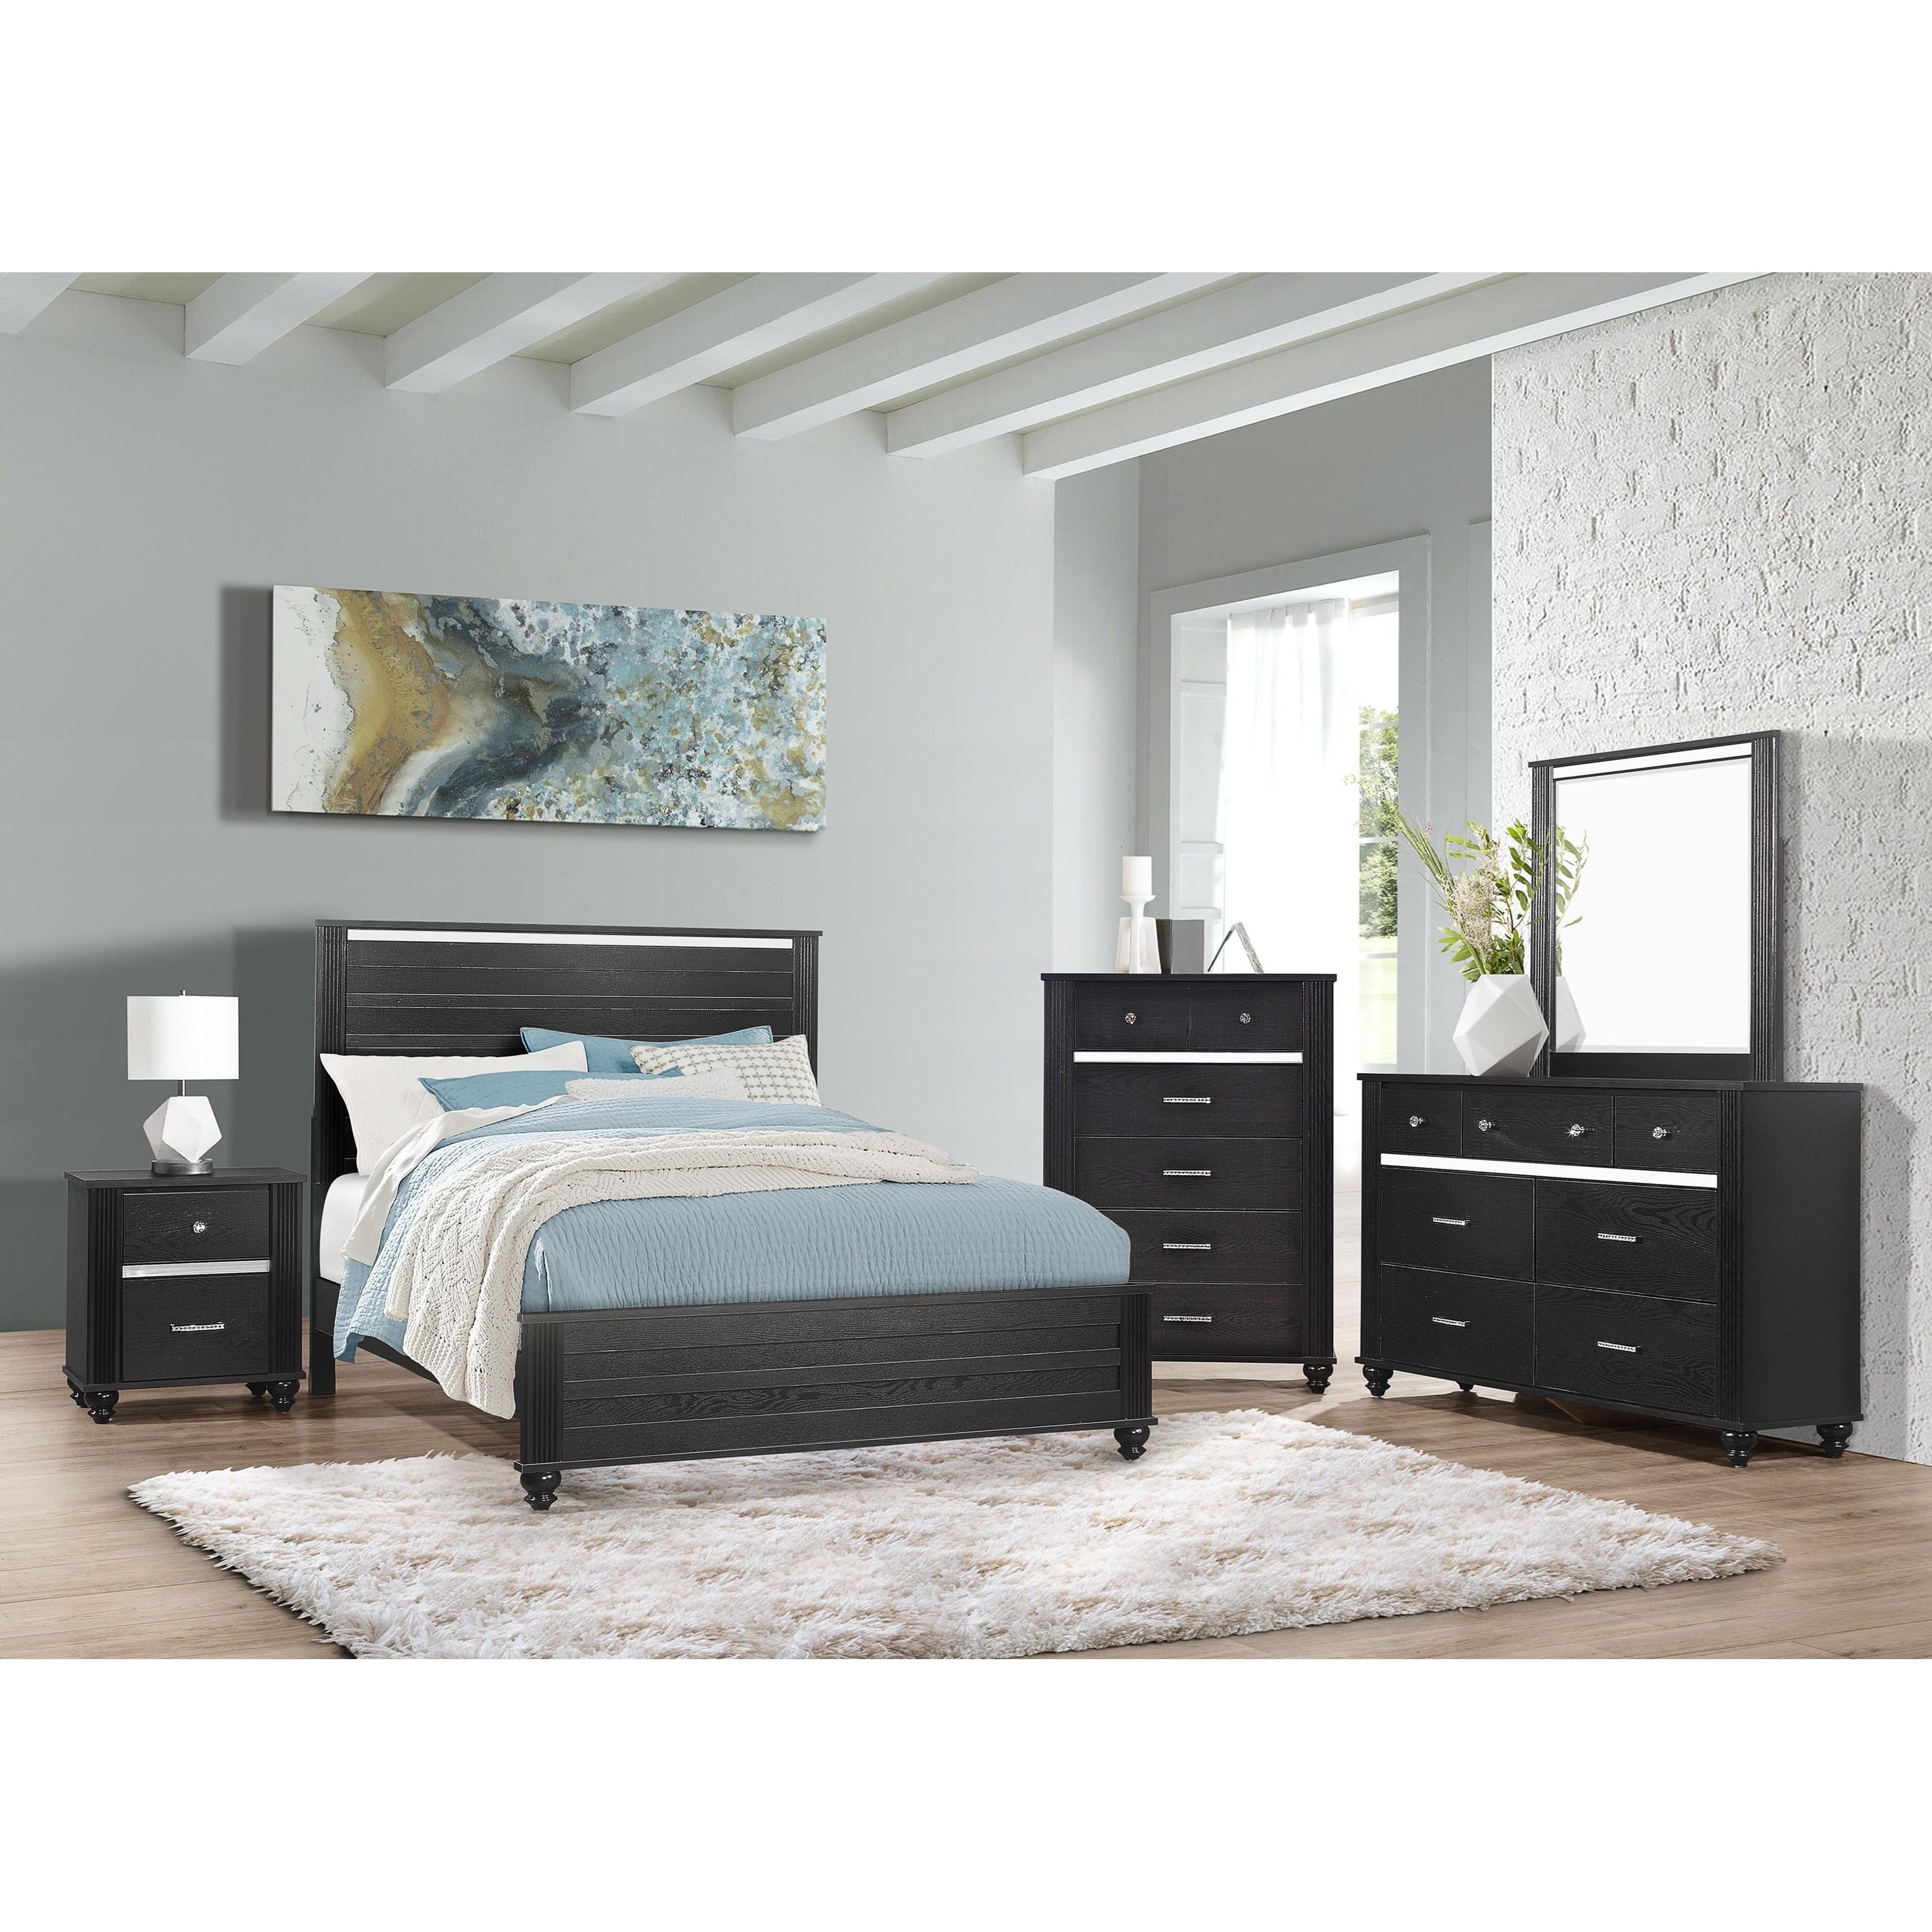 Gaston Queen Bedroom Group by Crown Mark at Pedigo Furniture